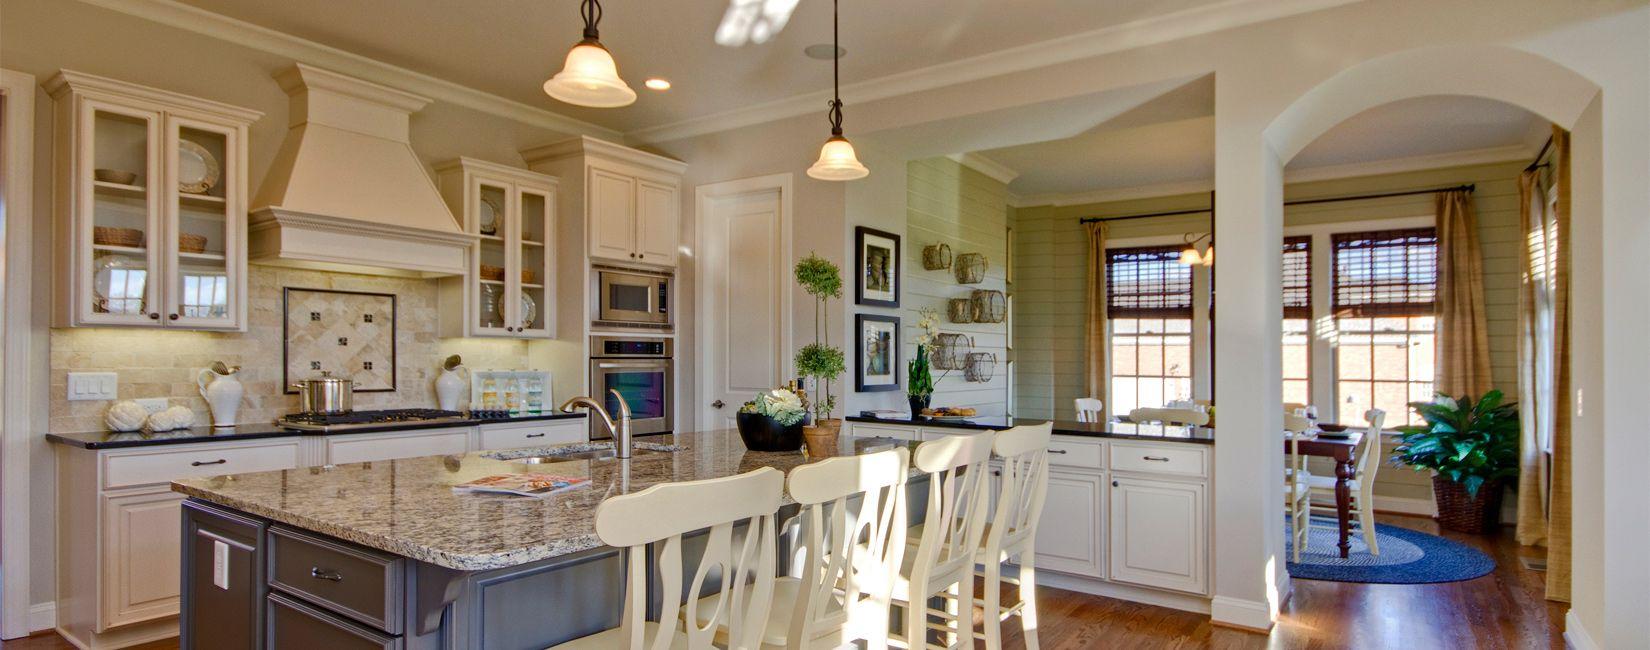 Taramore|New Homes Brentwood TN|New Homes Nashville TN|John Wieland ...